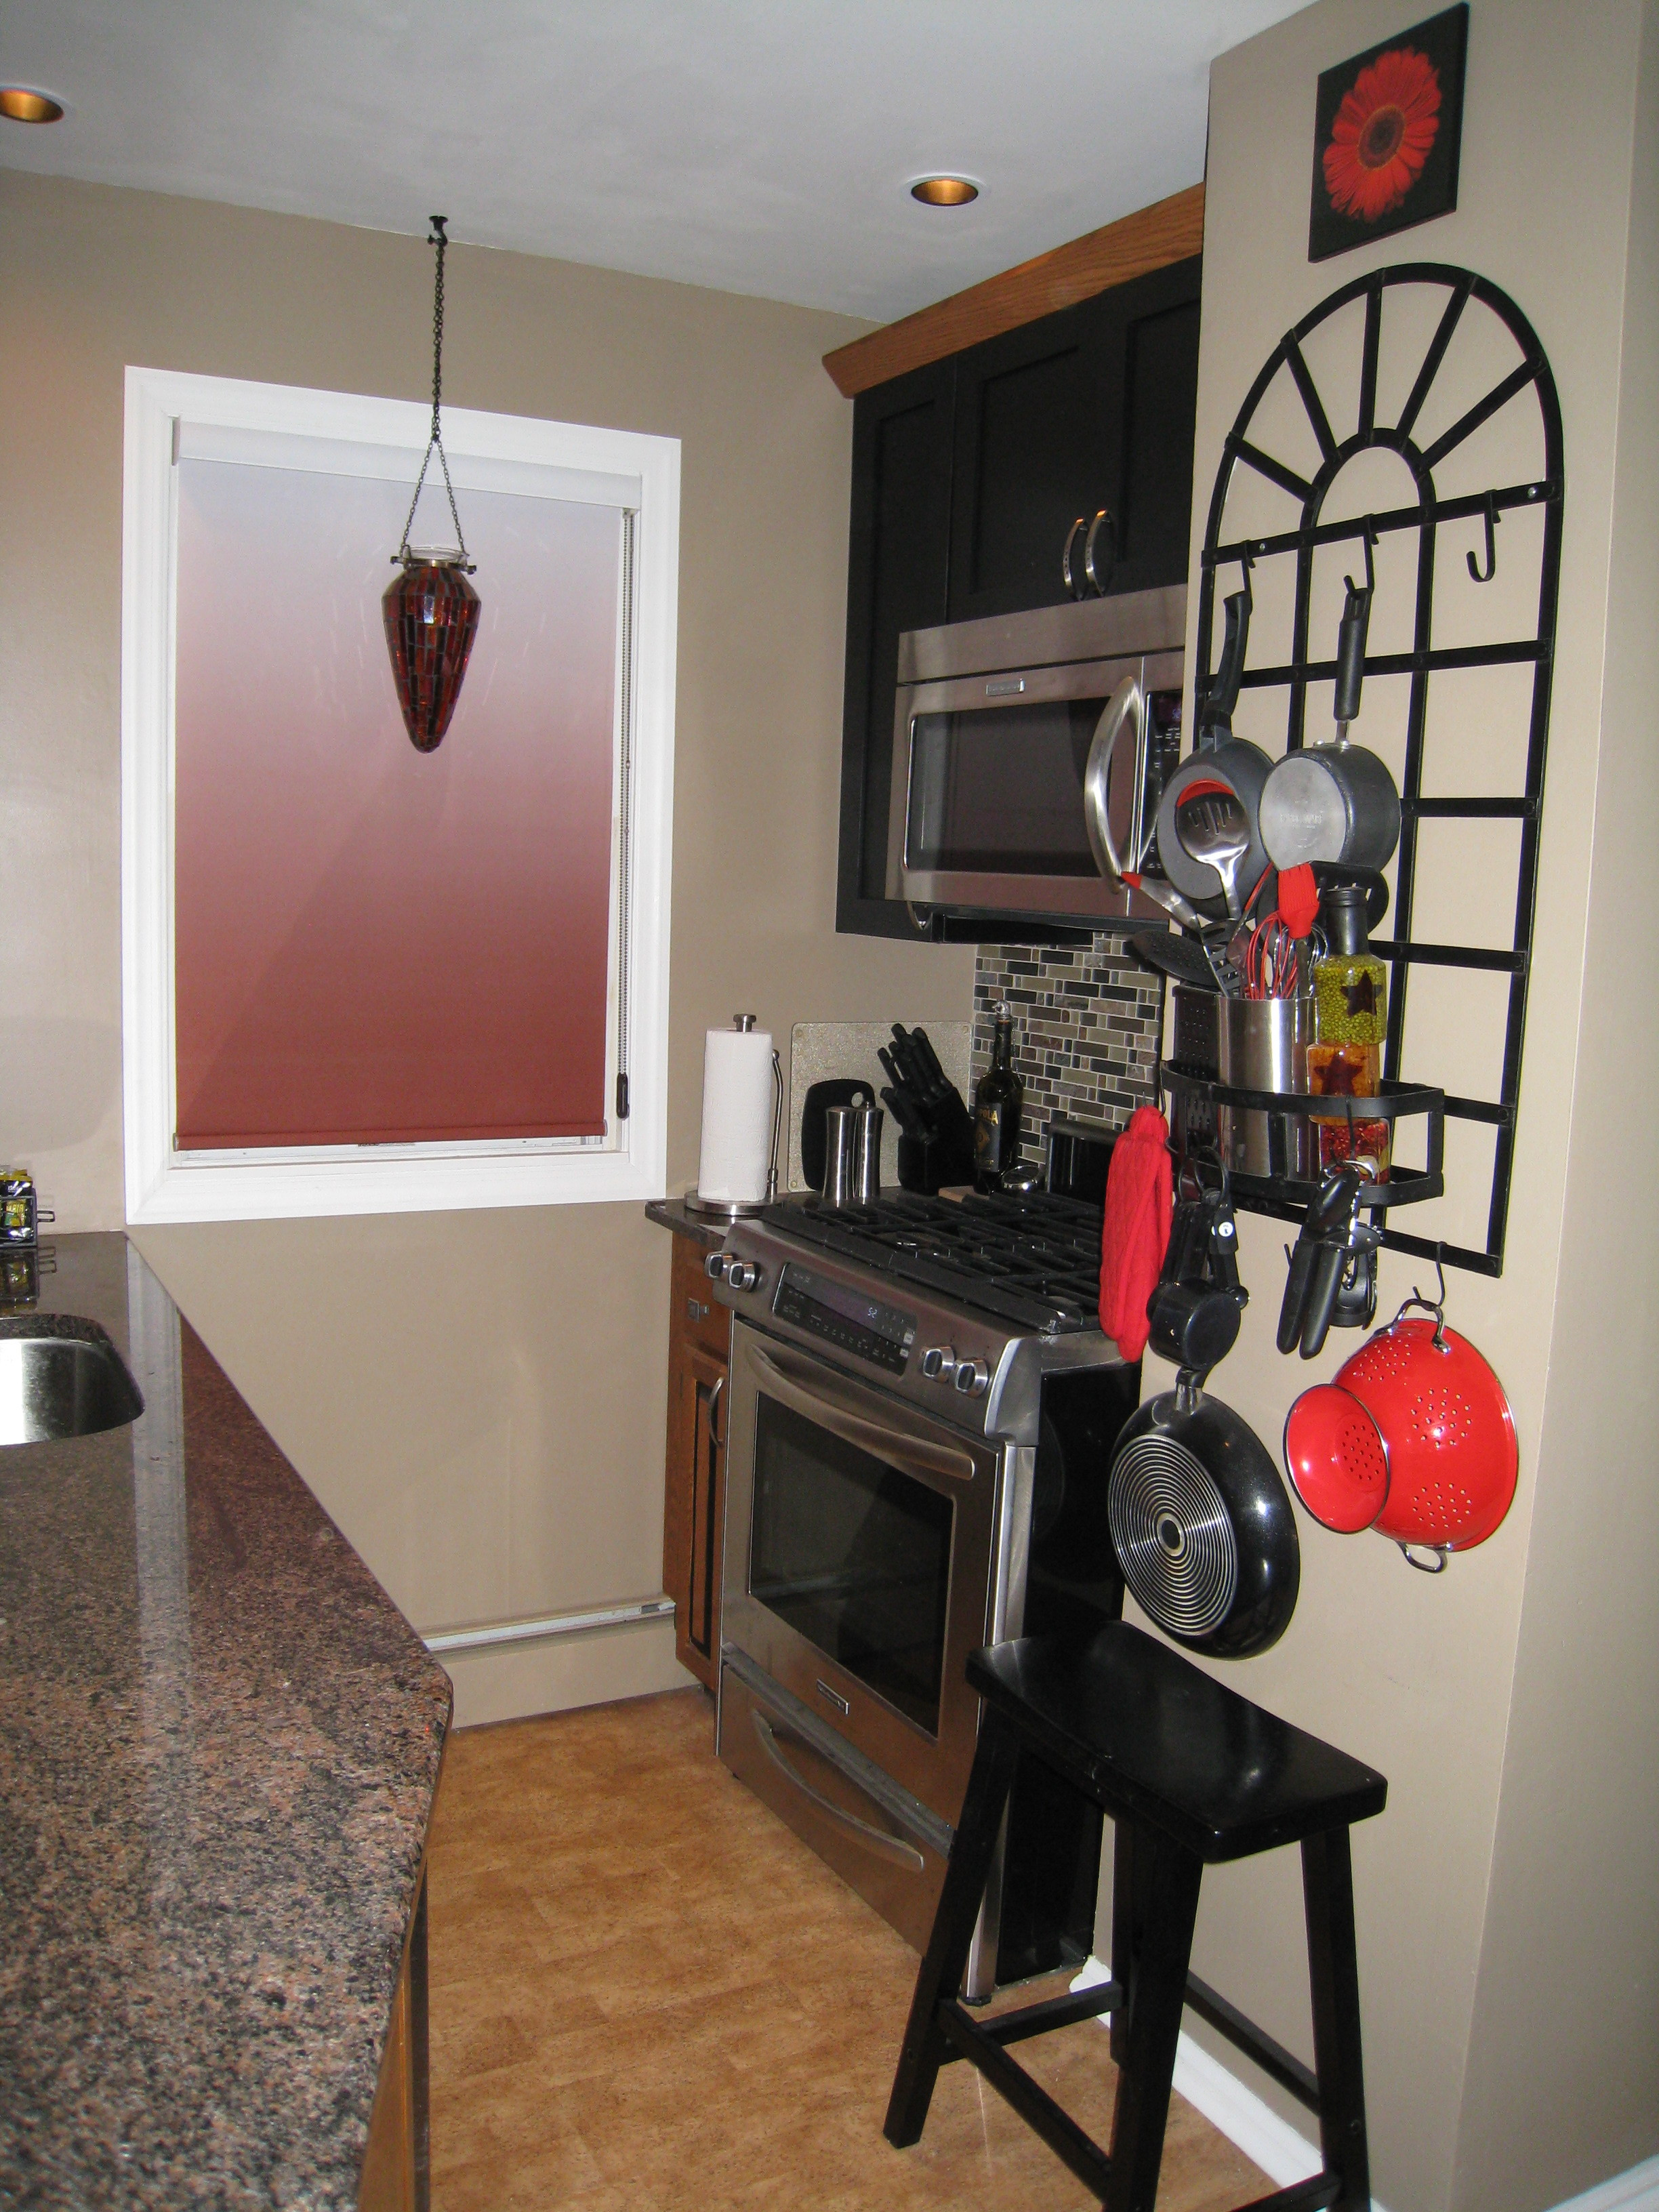 Lin kitchen afterIMG_2813.jpg